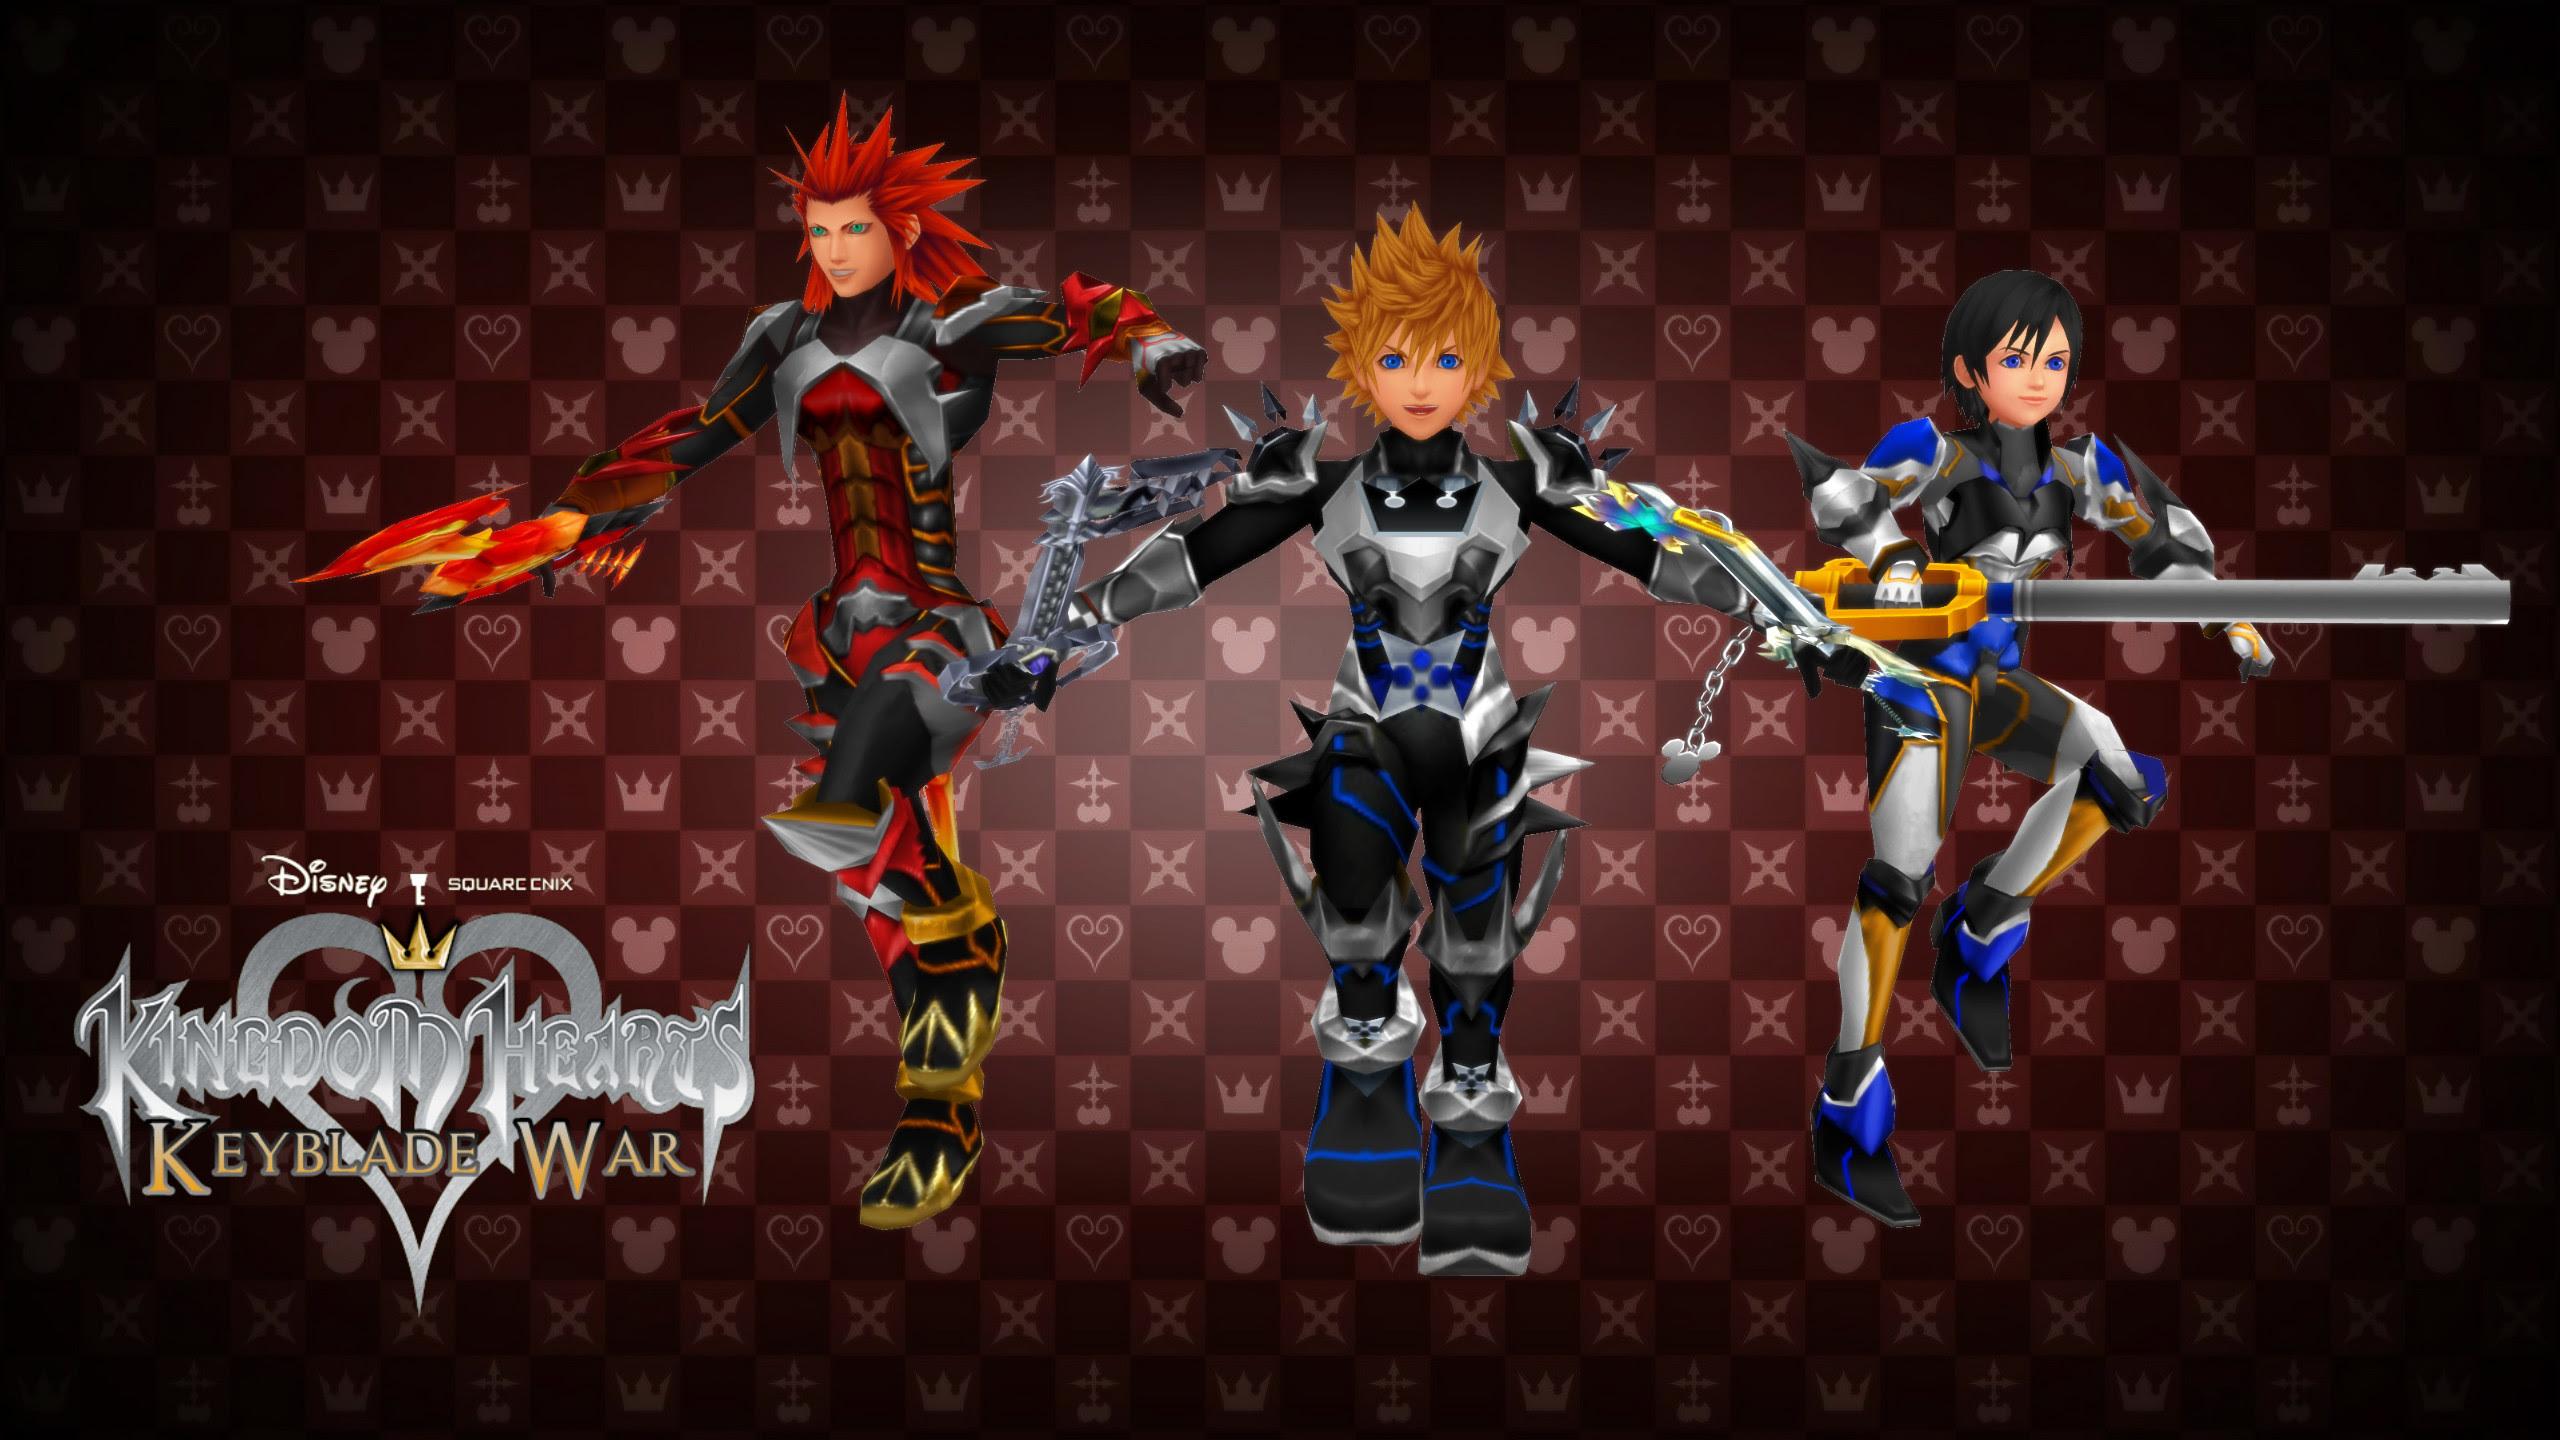 Axel Kingdom Hearts Wallpaper 70 Images